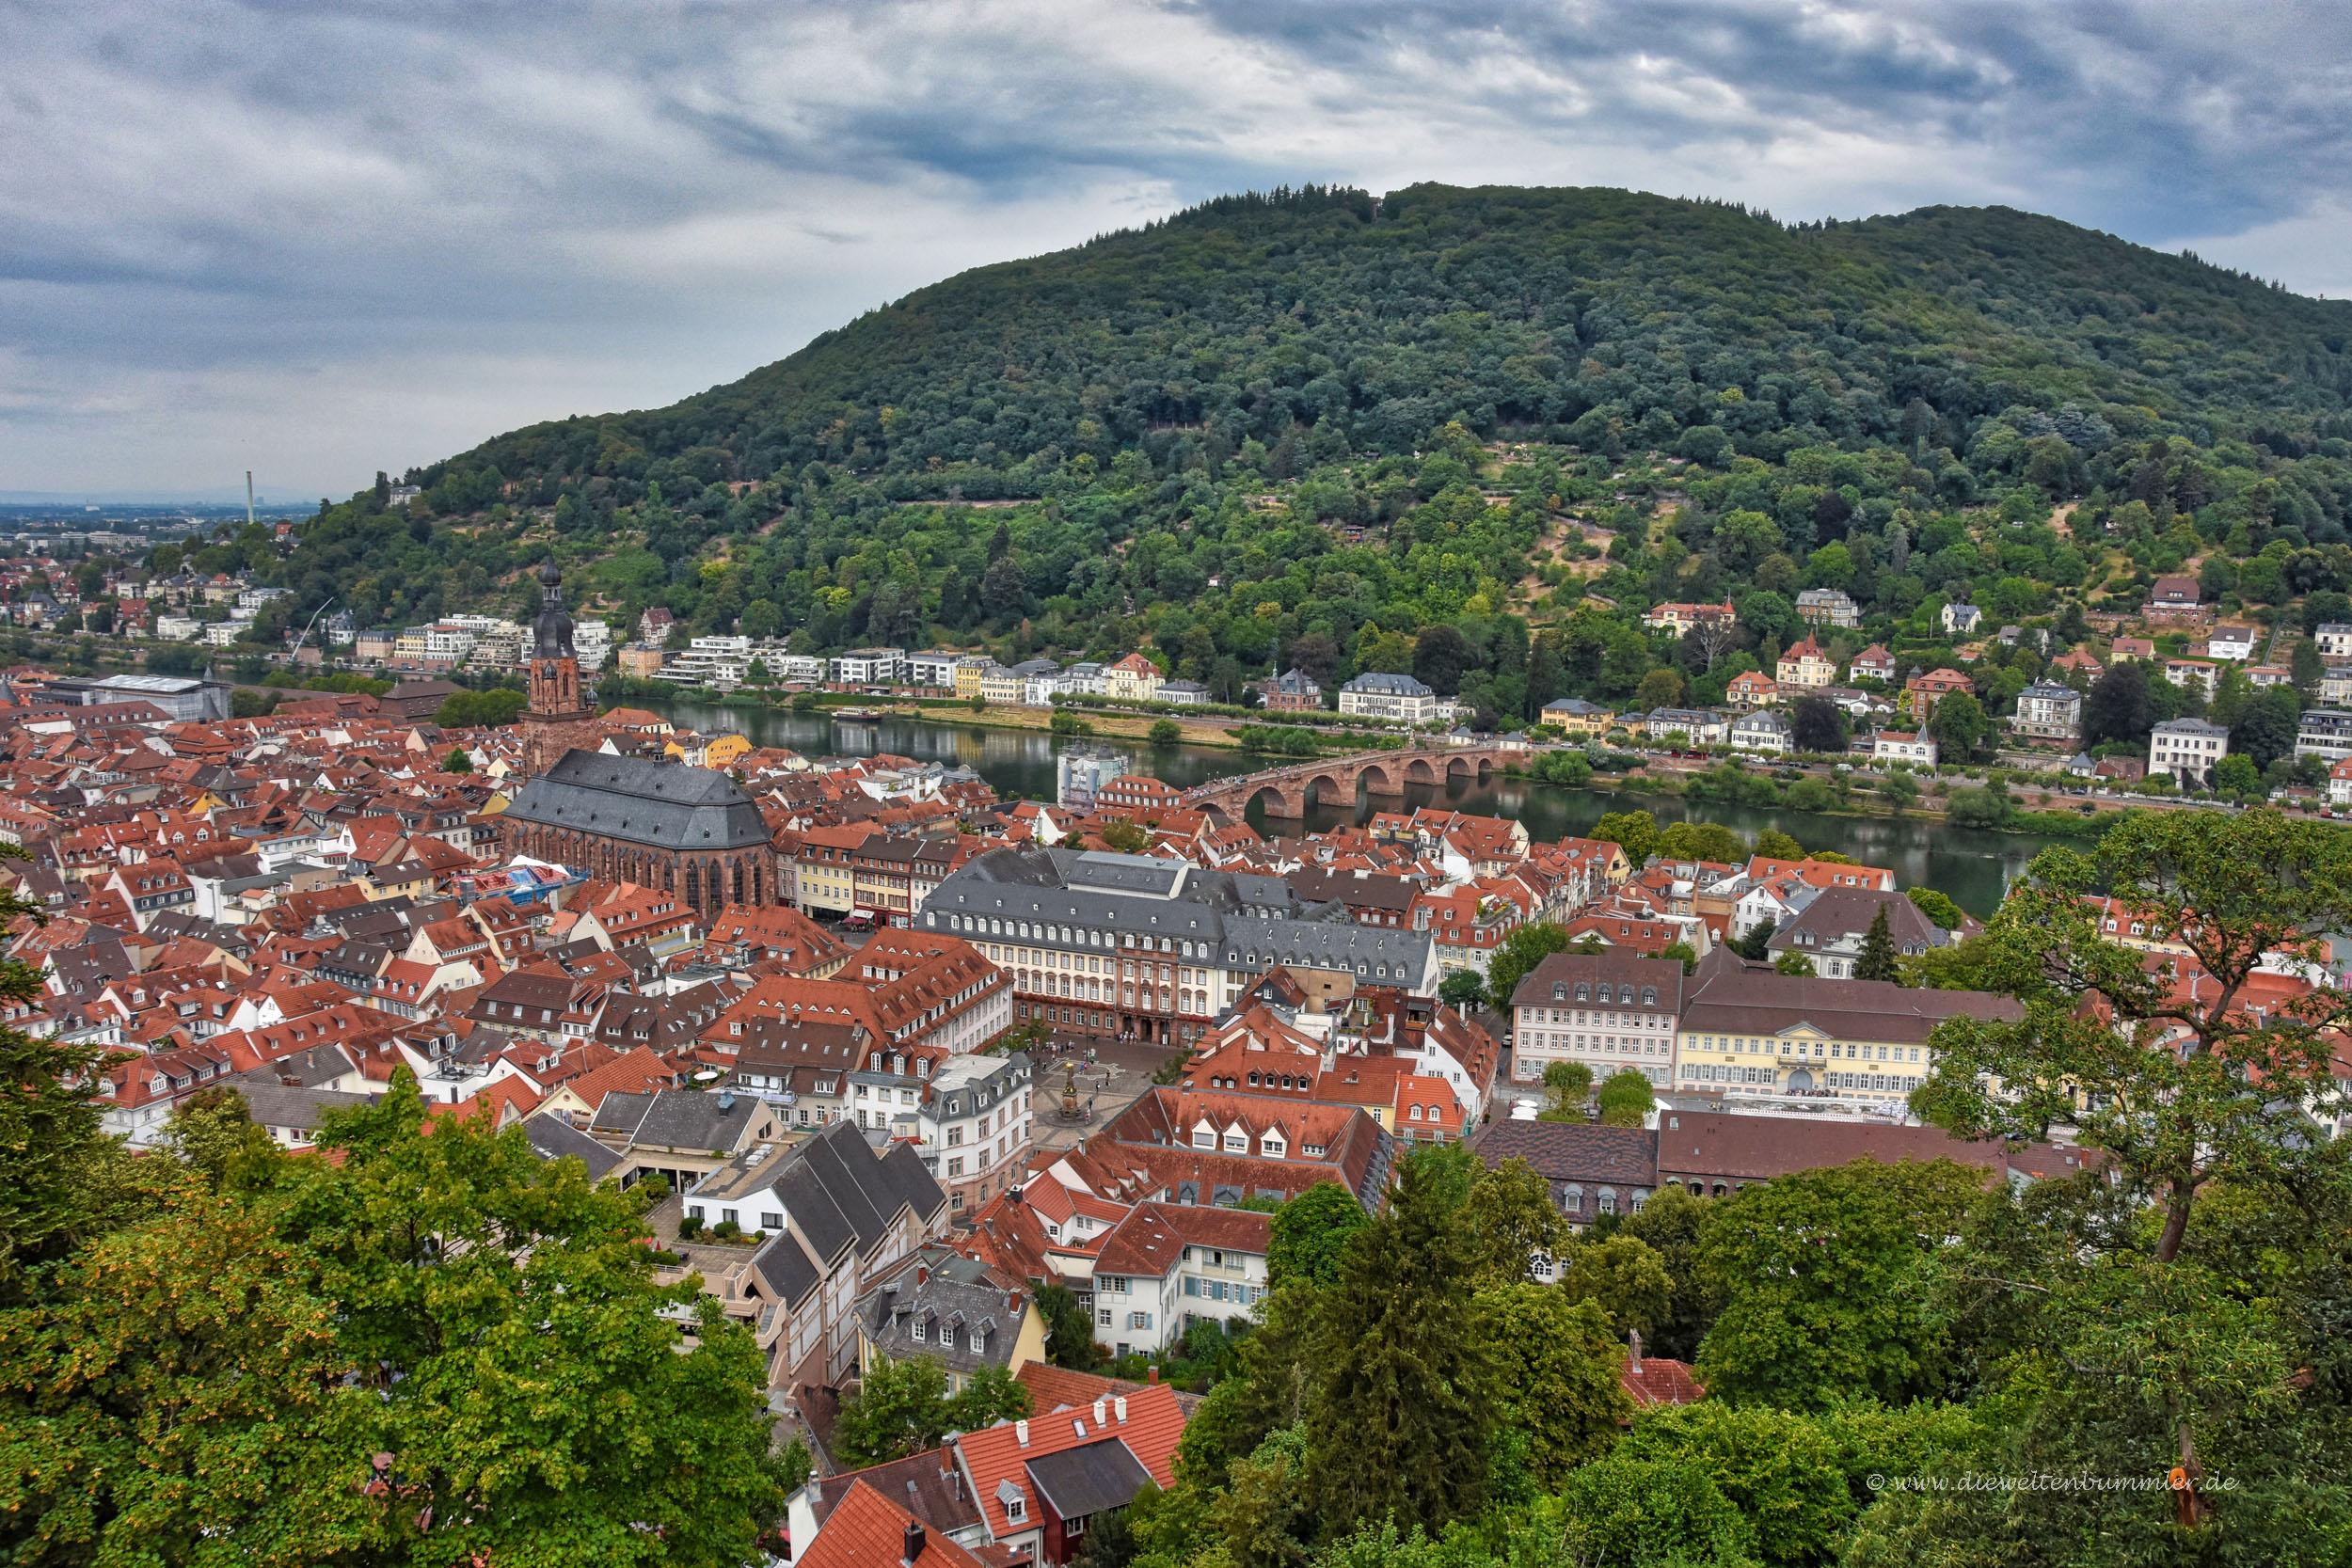 Ausblick über Heidelberg